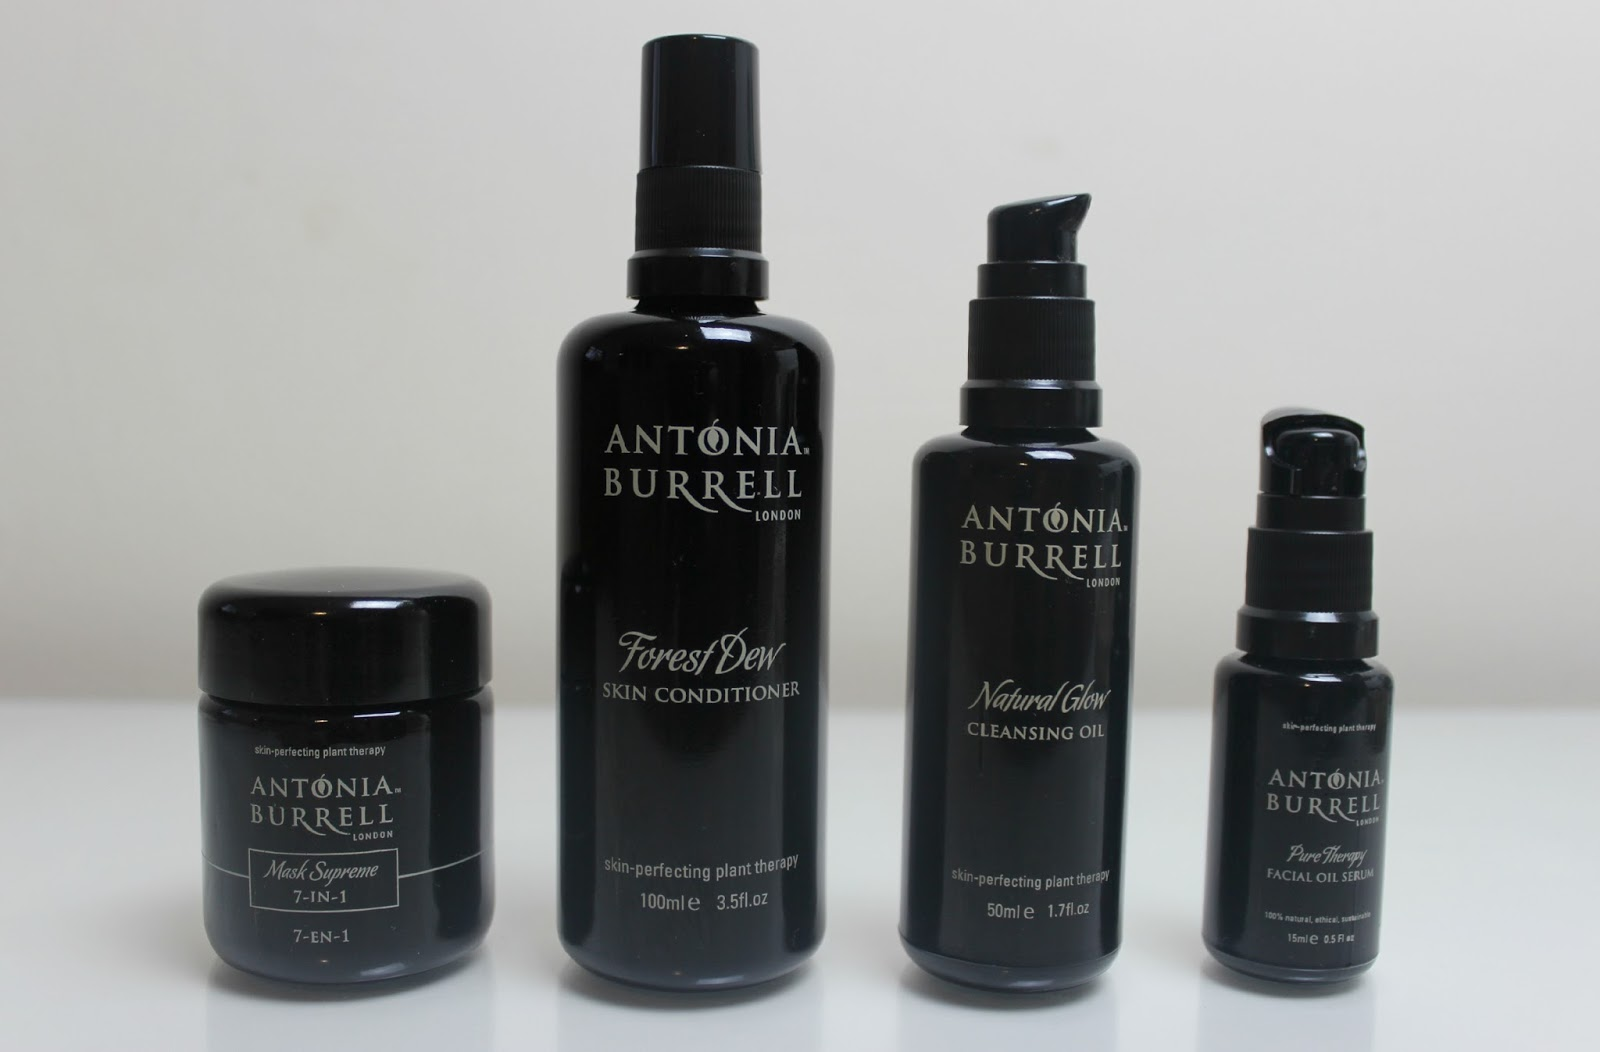 A picture of Antonia Burrell skincare